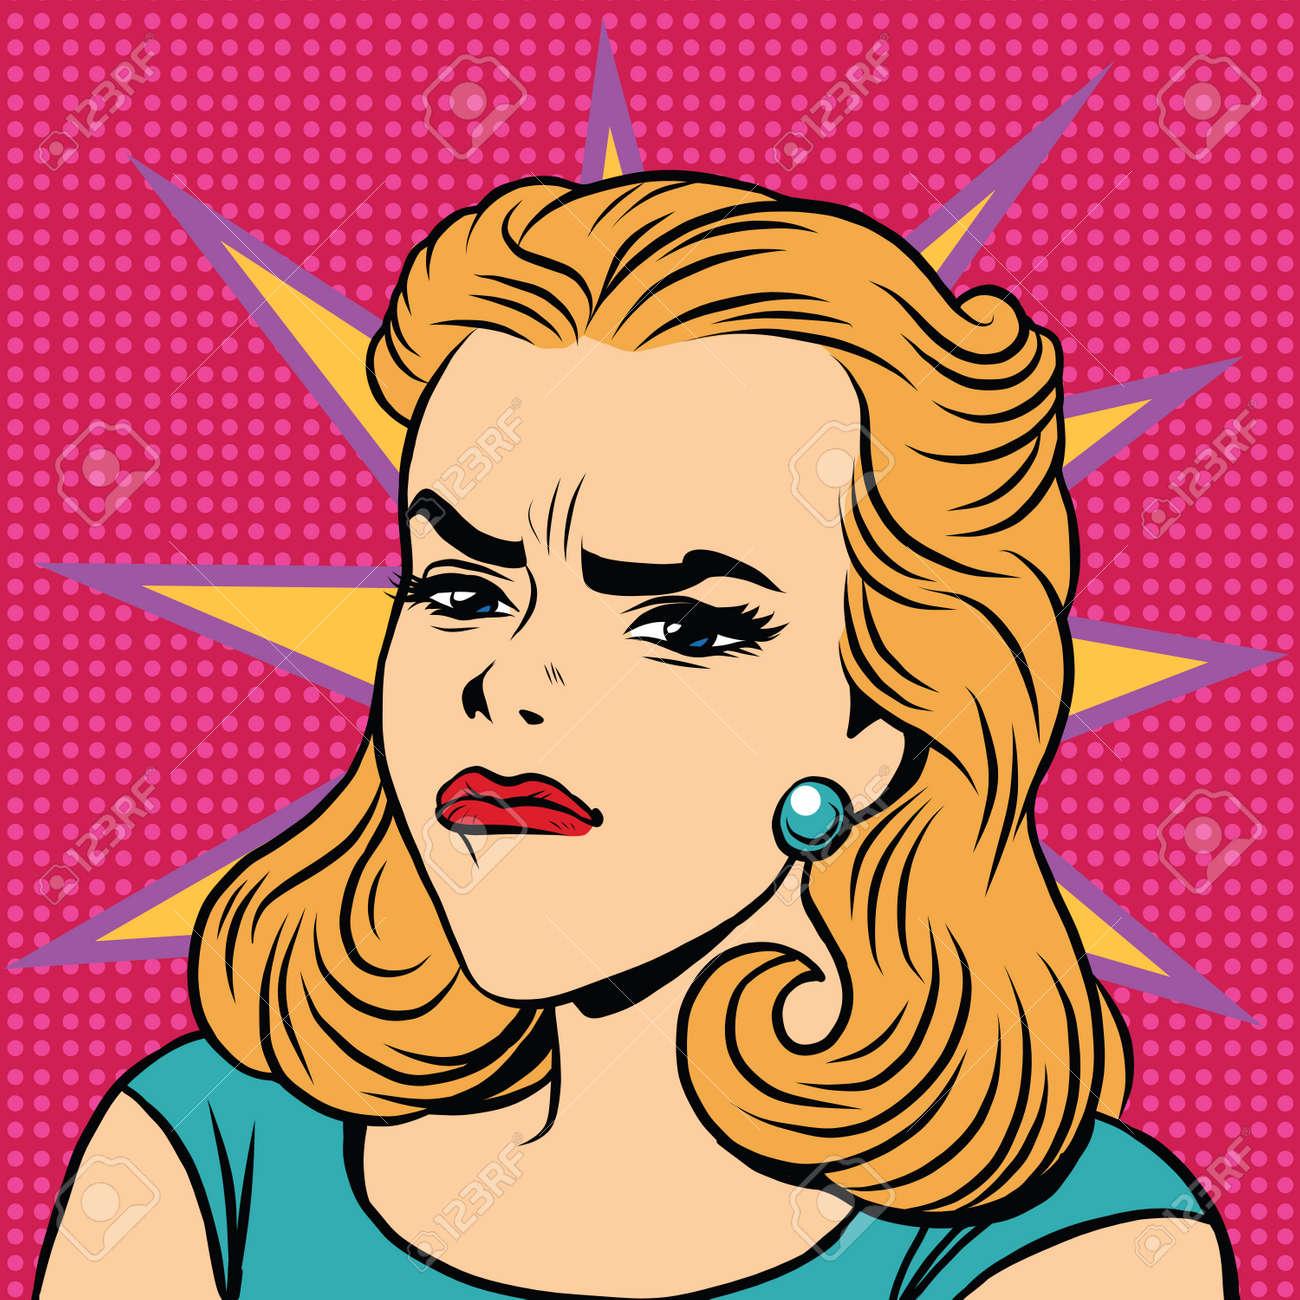 Emoji retro anger disgust girl emoticons pop art illustration emoji woman emotions girl